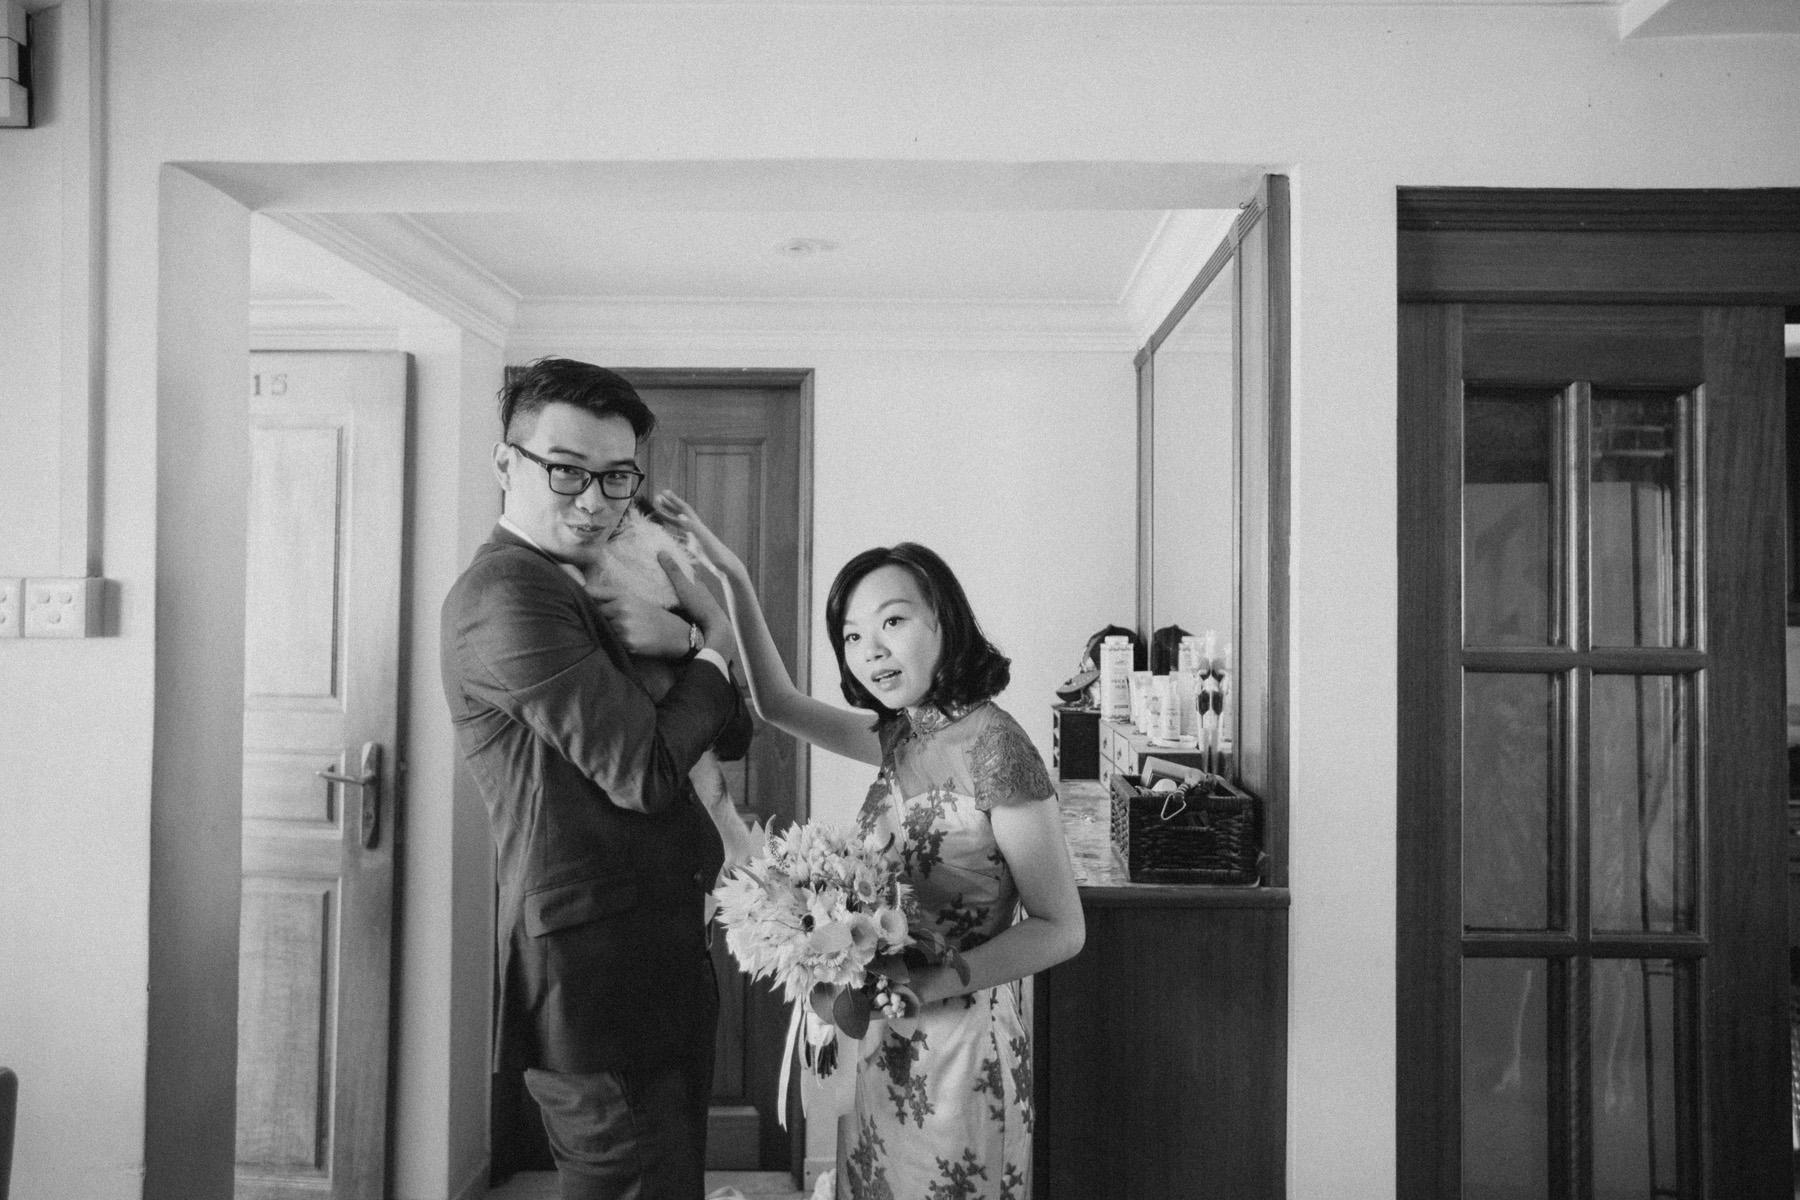 singapore-wedding-travel-photographer-faith-alvin-wedding-wmt-14.jpg